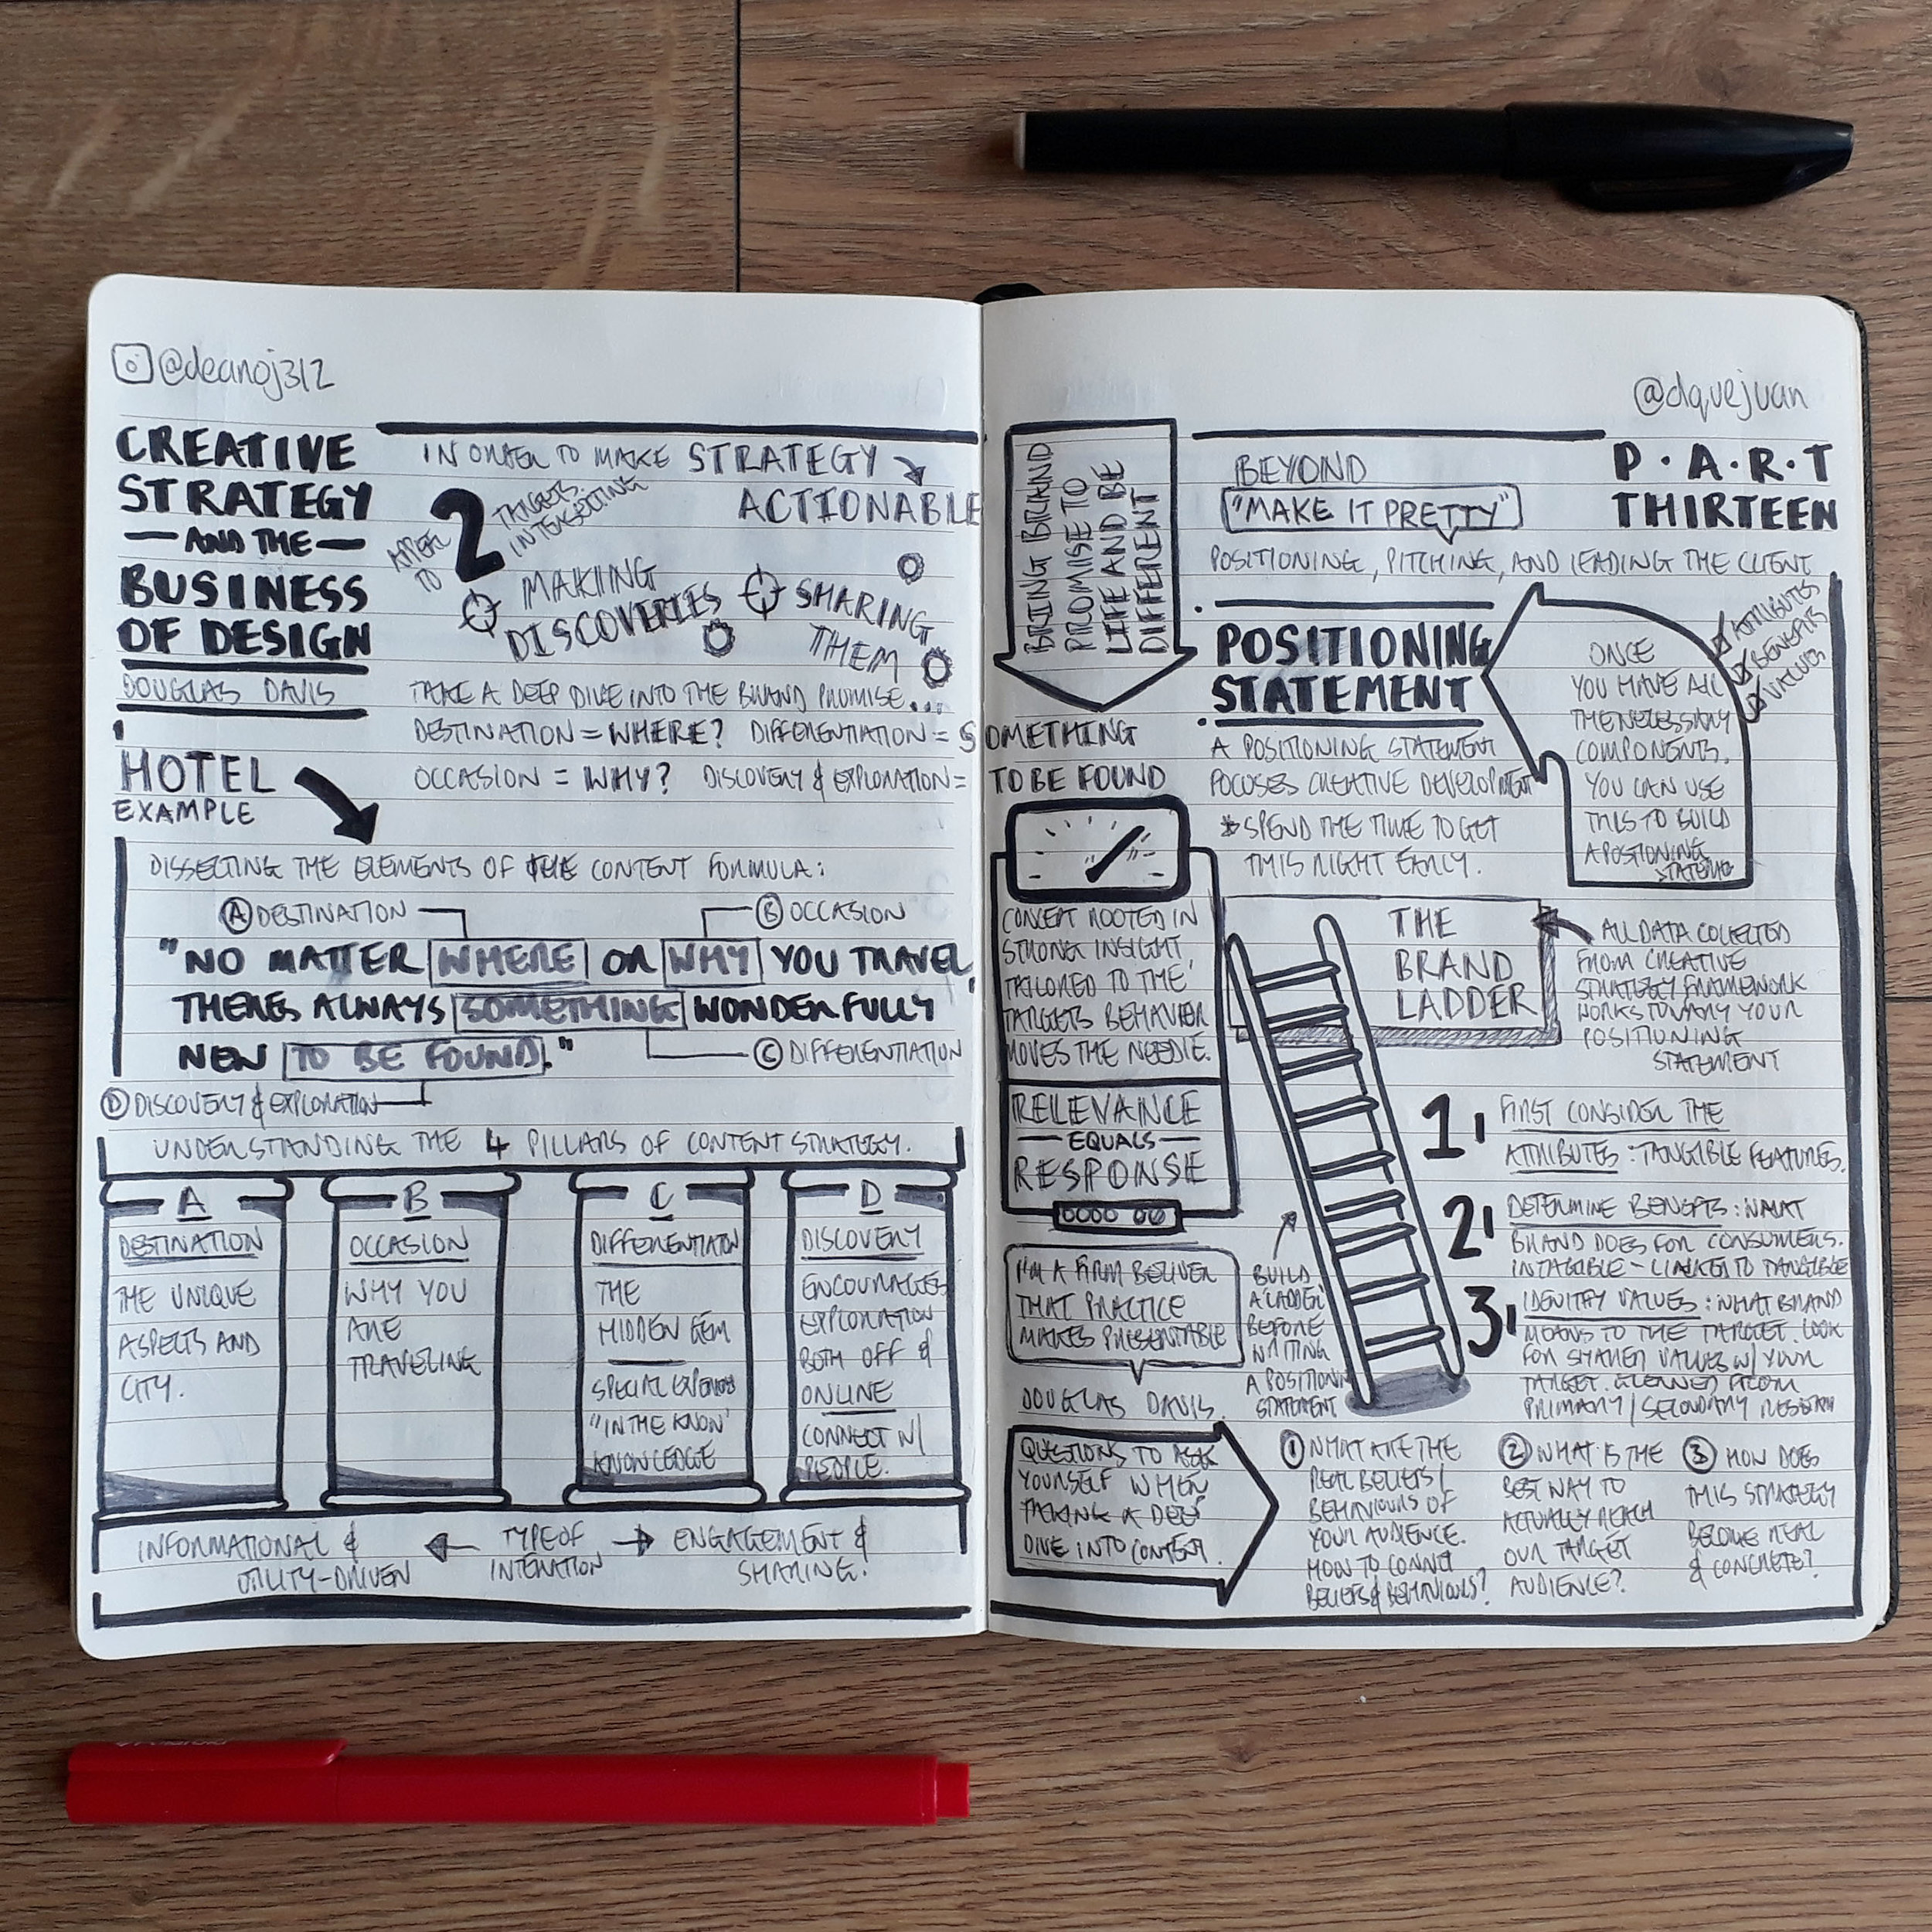 CreativeStrategyAndTheBusinessOfDesign_Part13.1.jpg